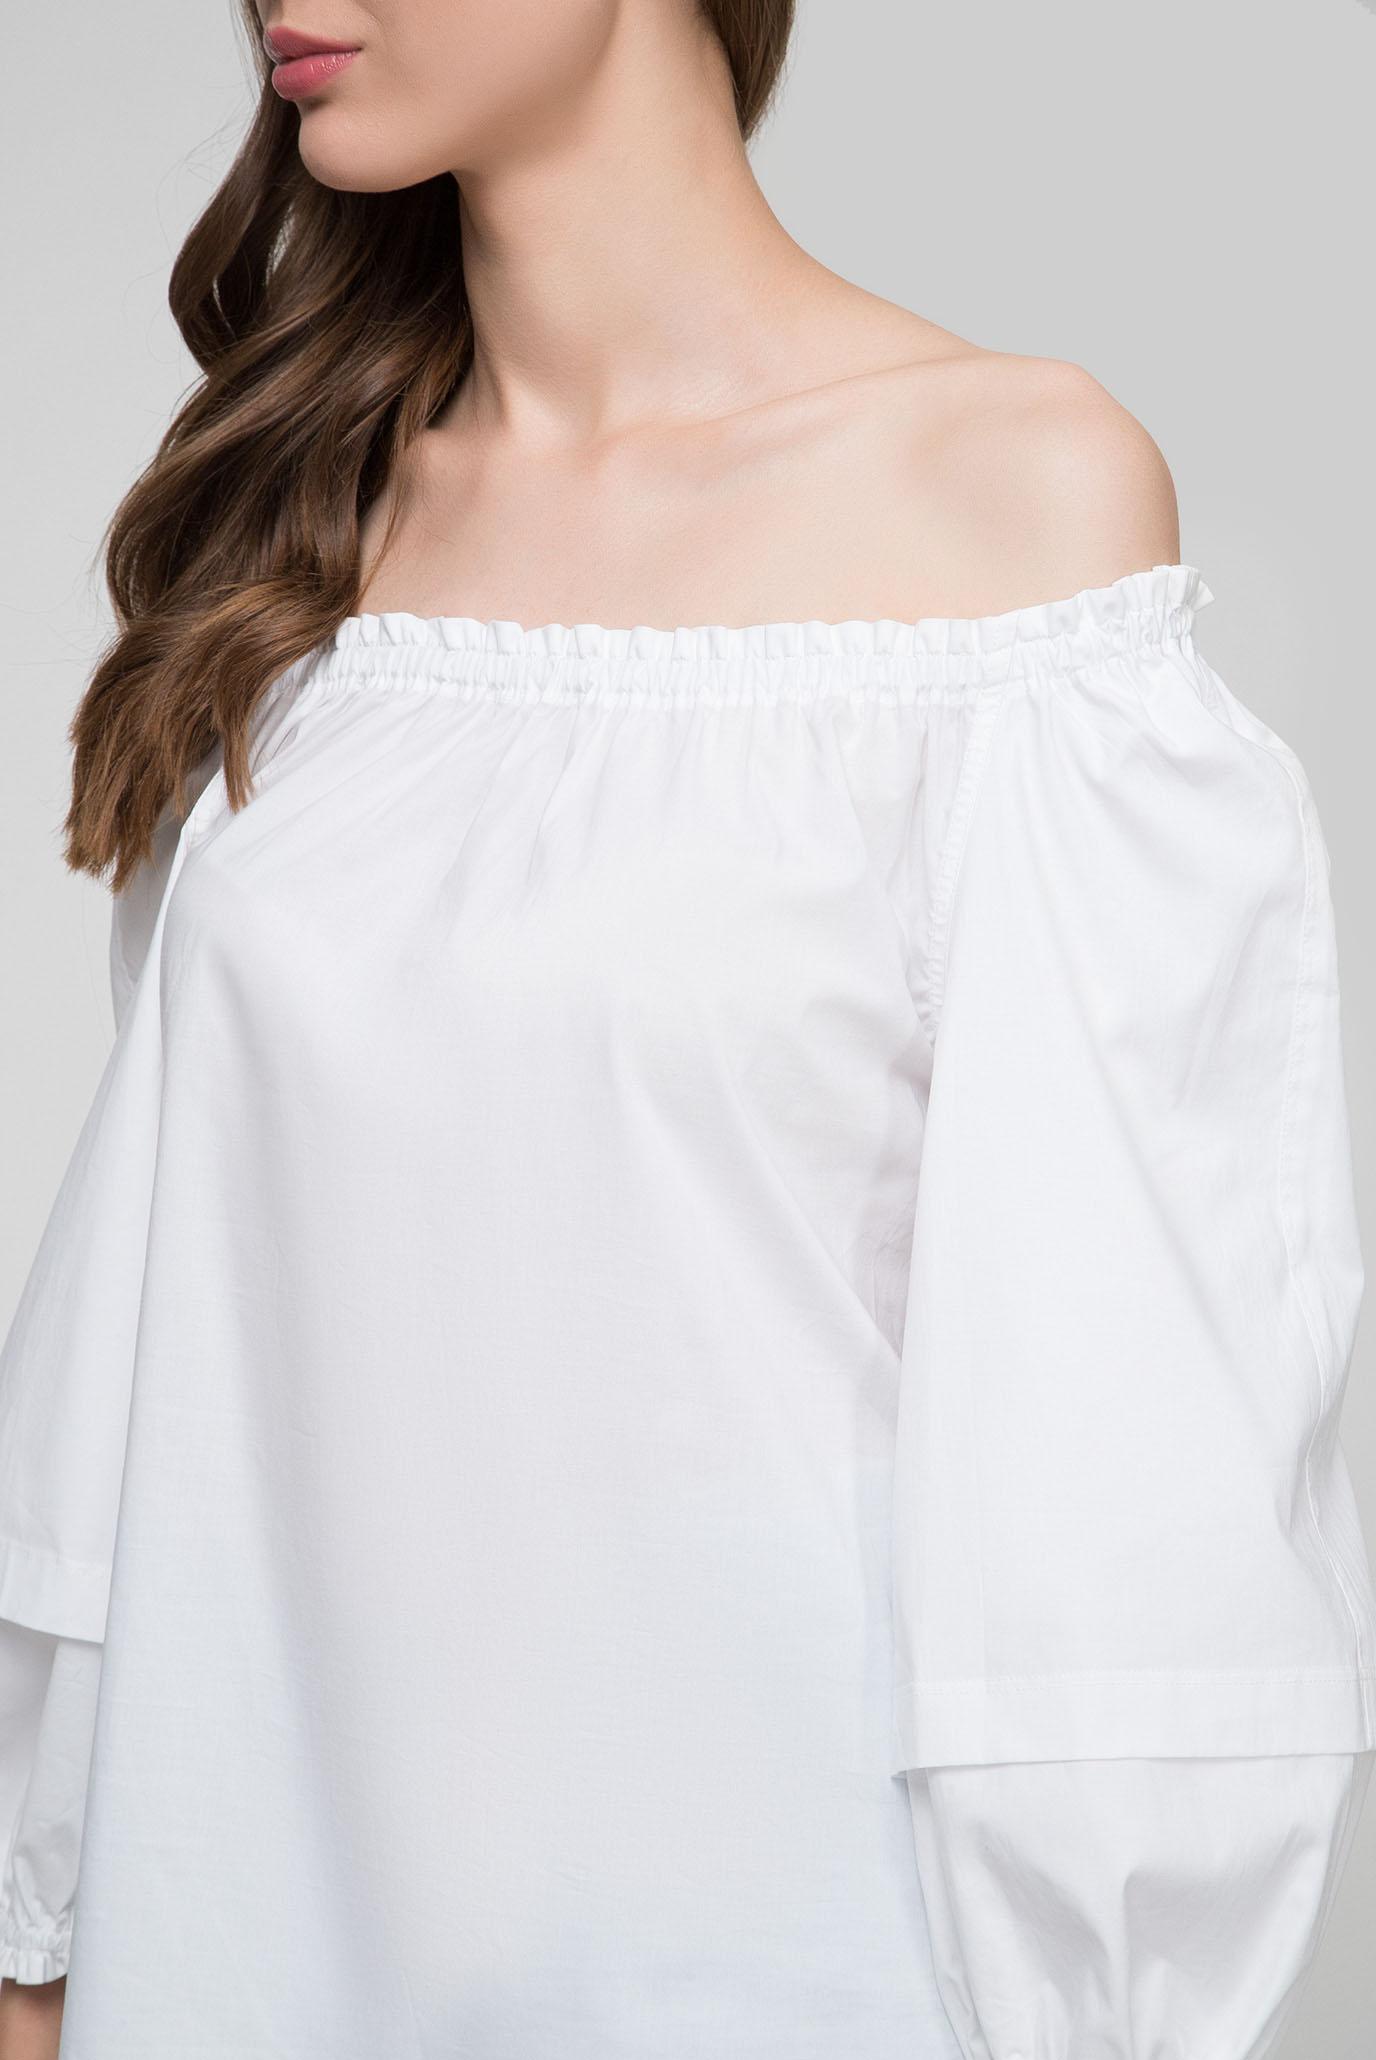 Купить Женская белая блуза PRONOUNCED SLV BLOUSE Calvin Klein Calvin Klein K20K200665 – Киев, Украина. Цены в интернет магазине MD Fashion